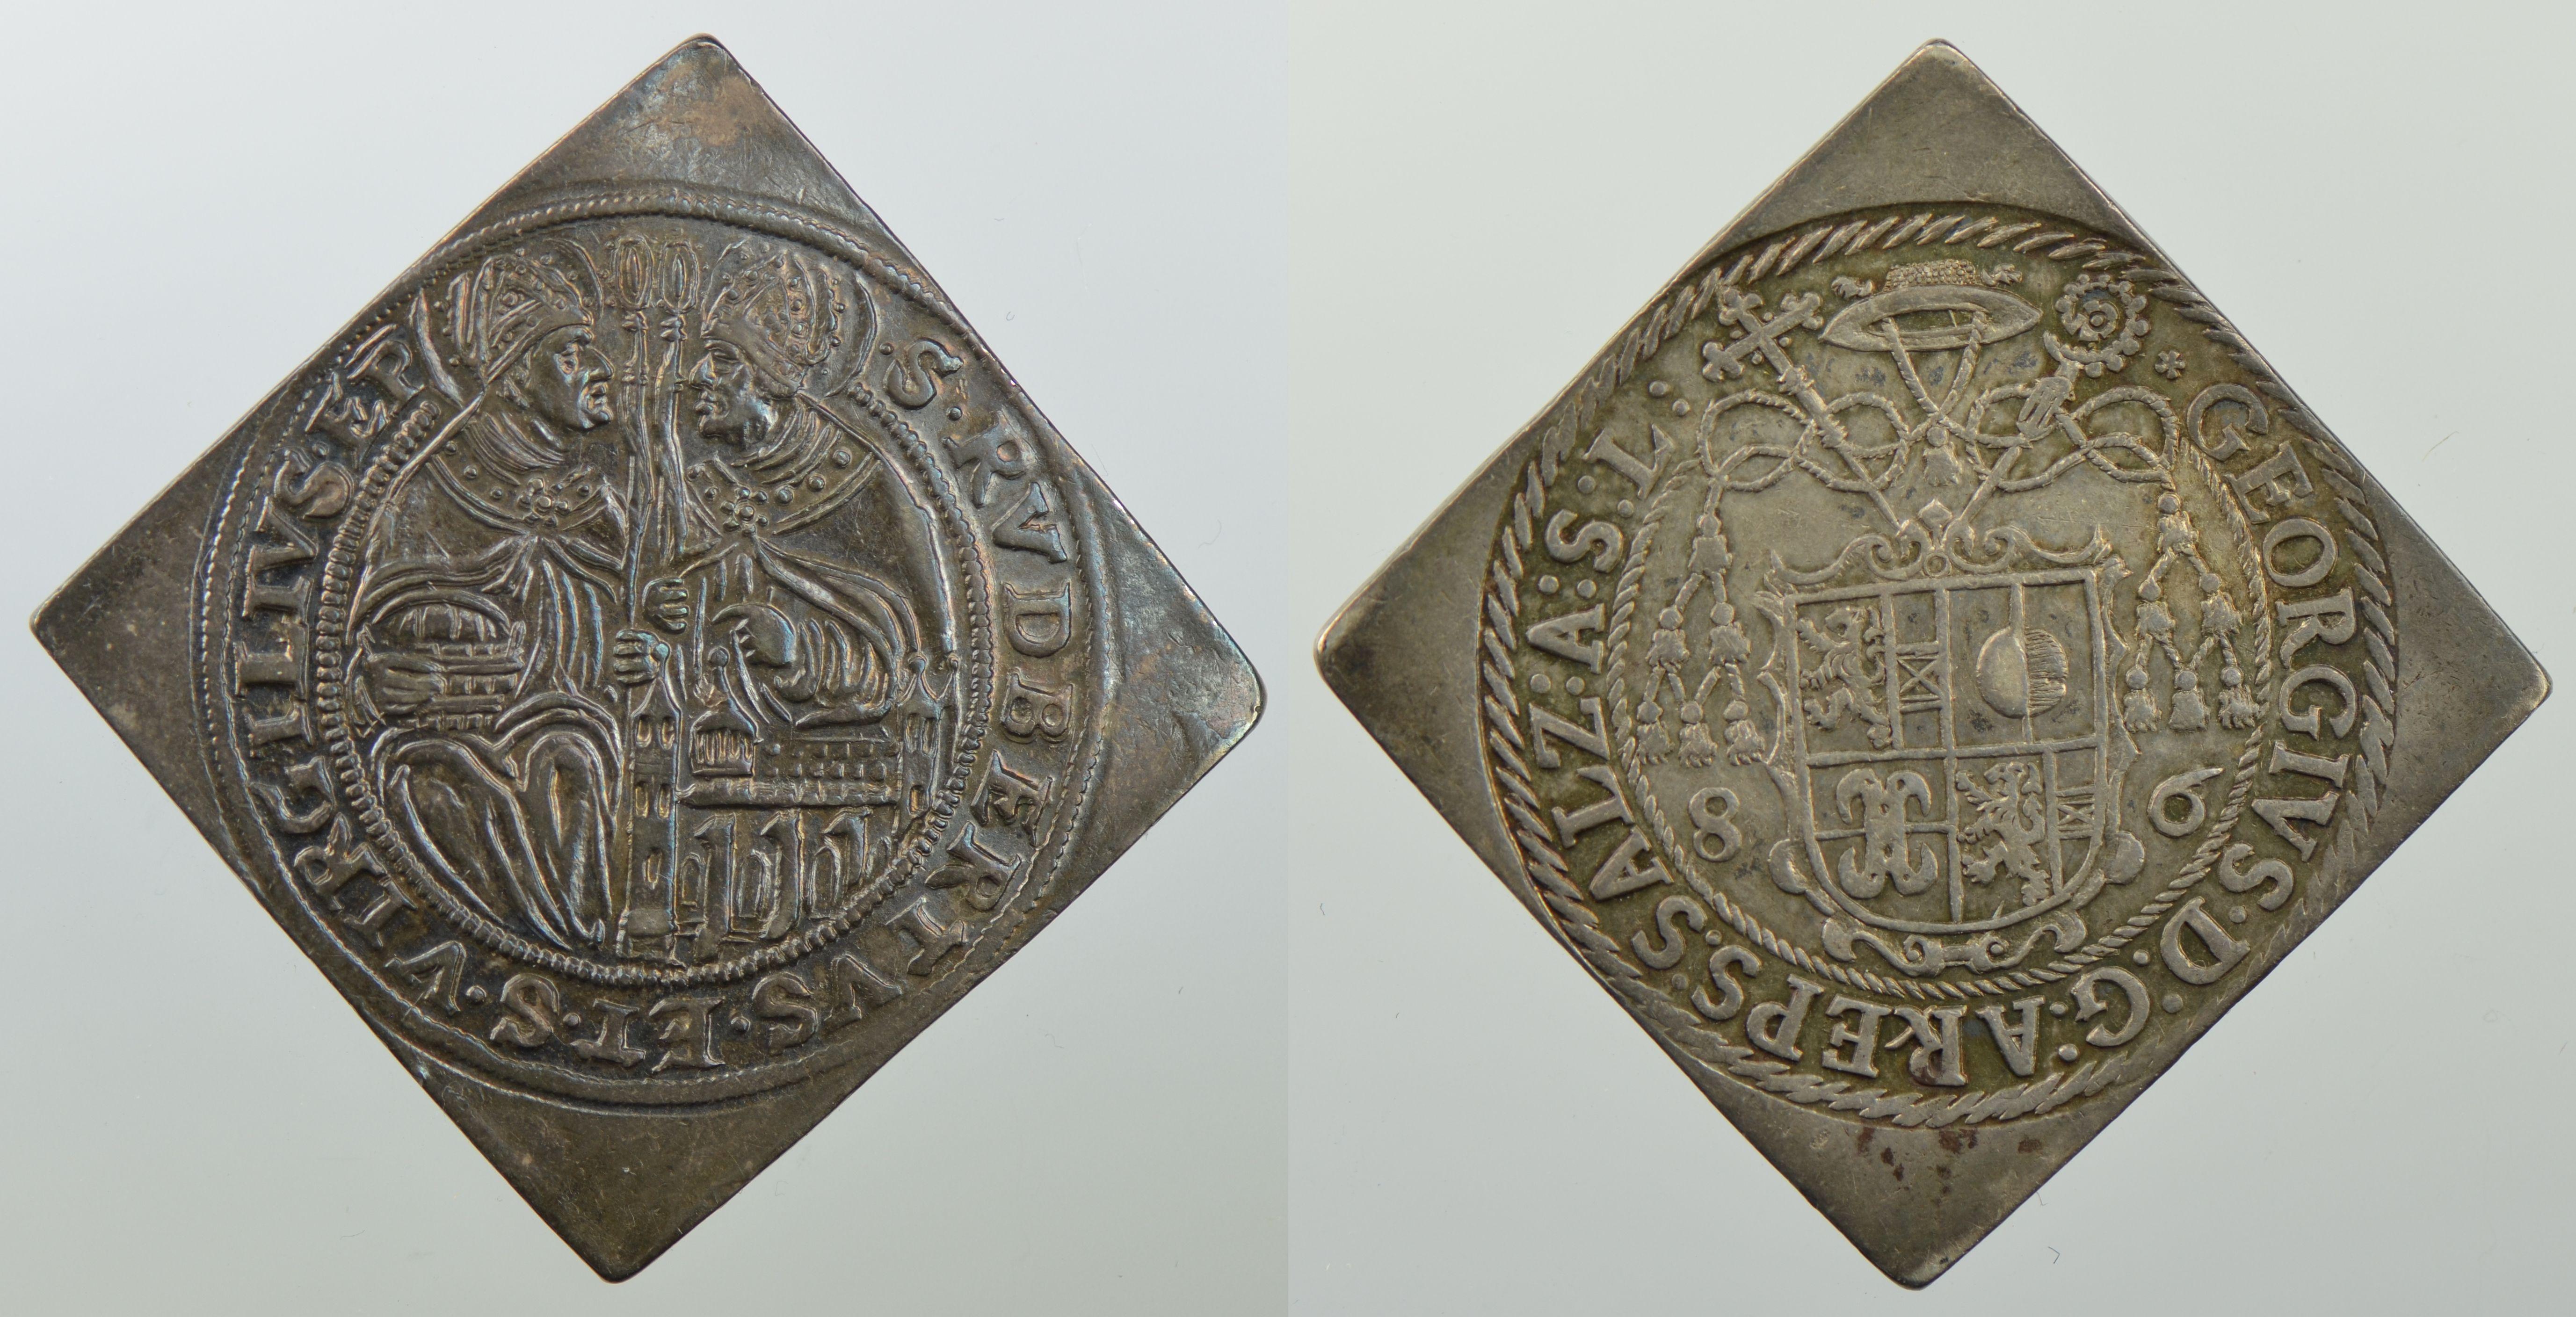 Halbtalerklippe 1586, Schweizer Nationalmuseum